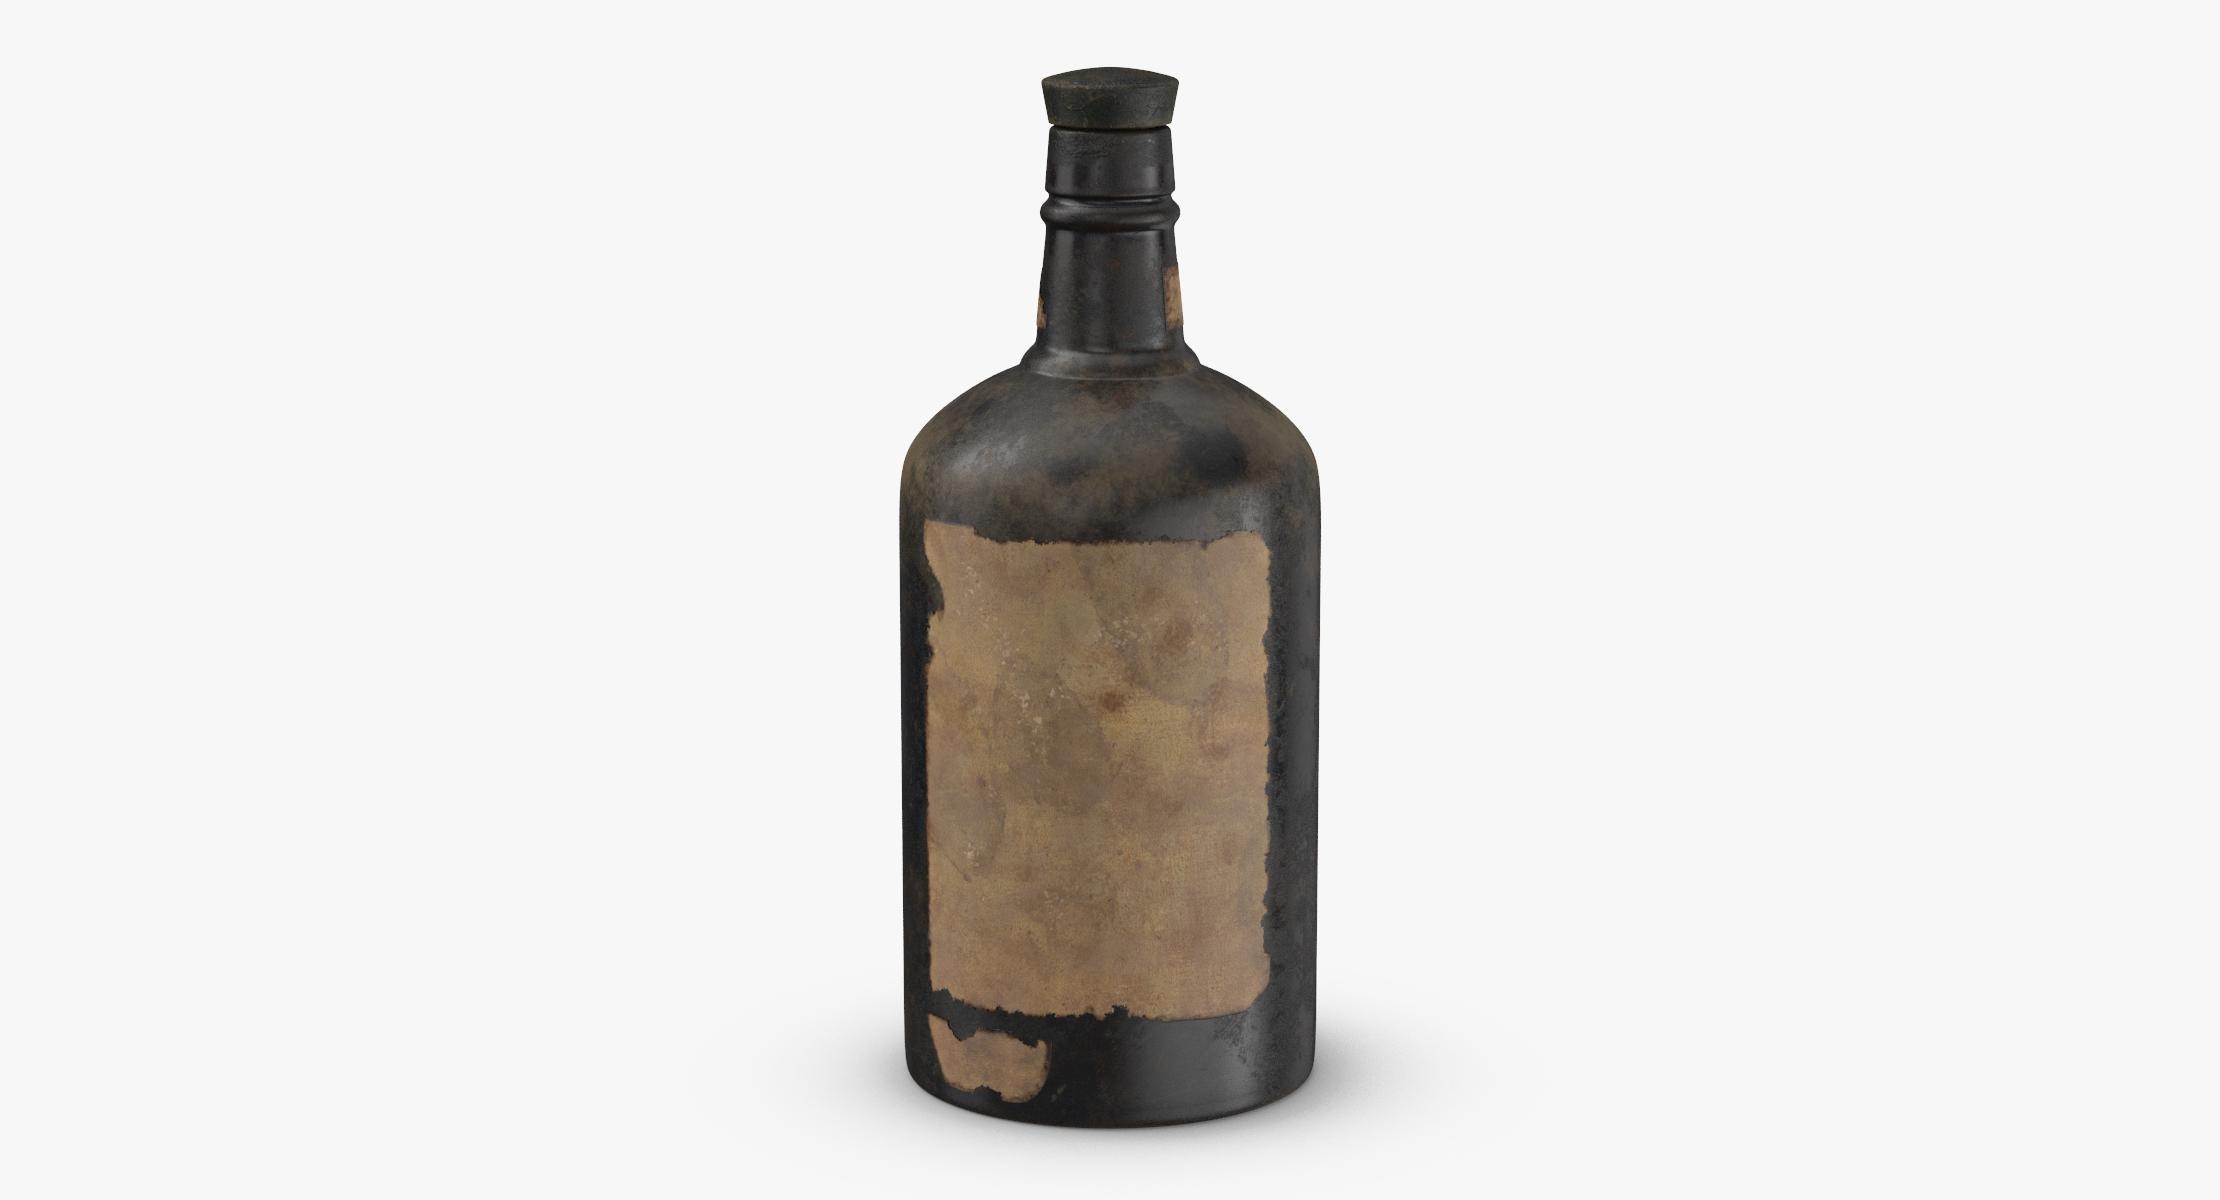 Old Bottle of Alcohol 04 - reel 1